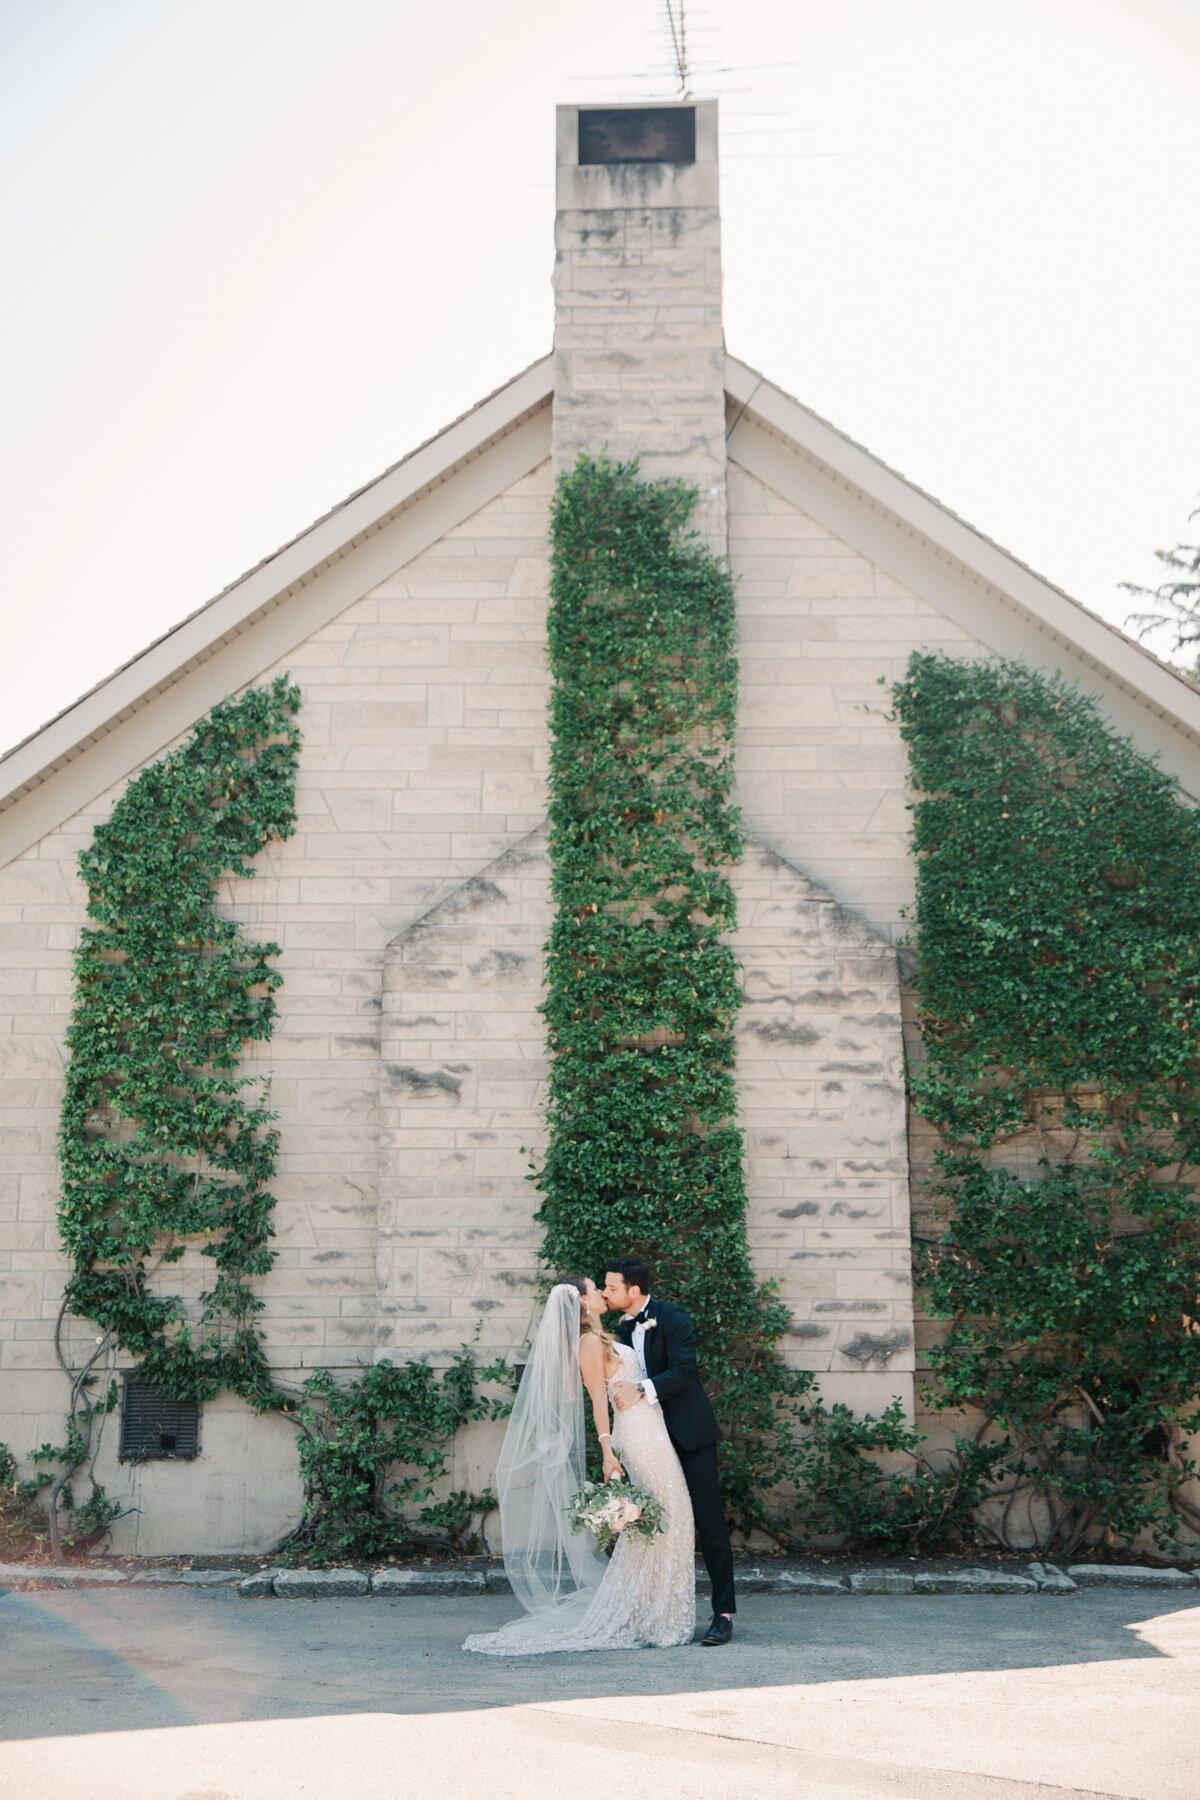 Chateau-des-Charmes-Wedding-Summer-Vineyard-Bride-Niagara-on-the-Lake-photos-by-Gemini-Photography-Ontario-0034.jpg